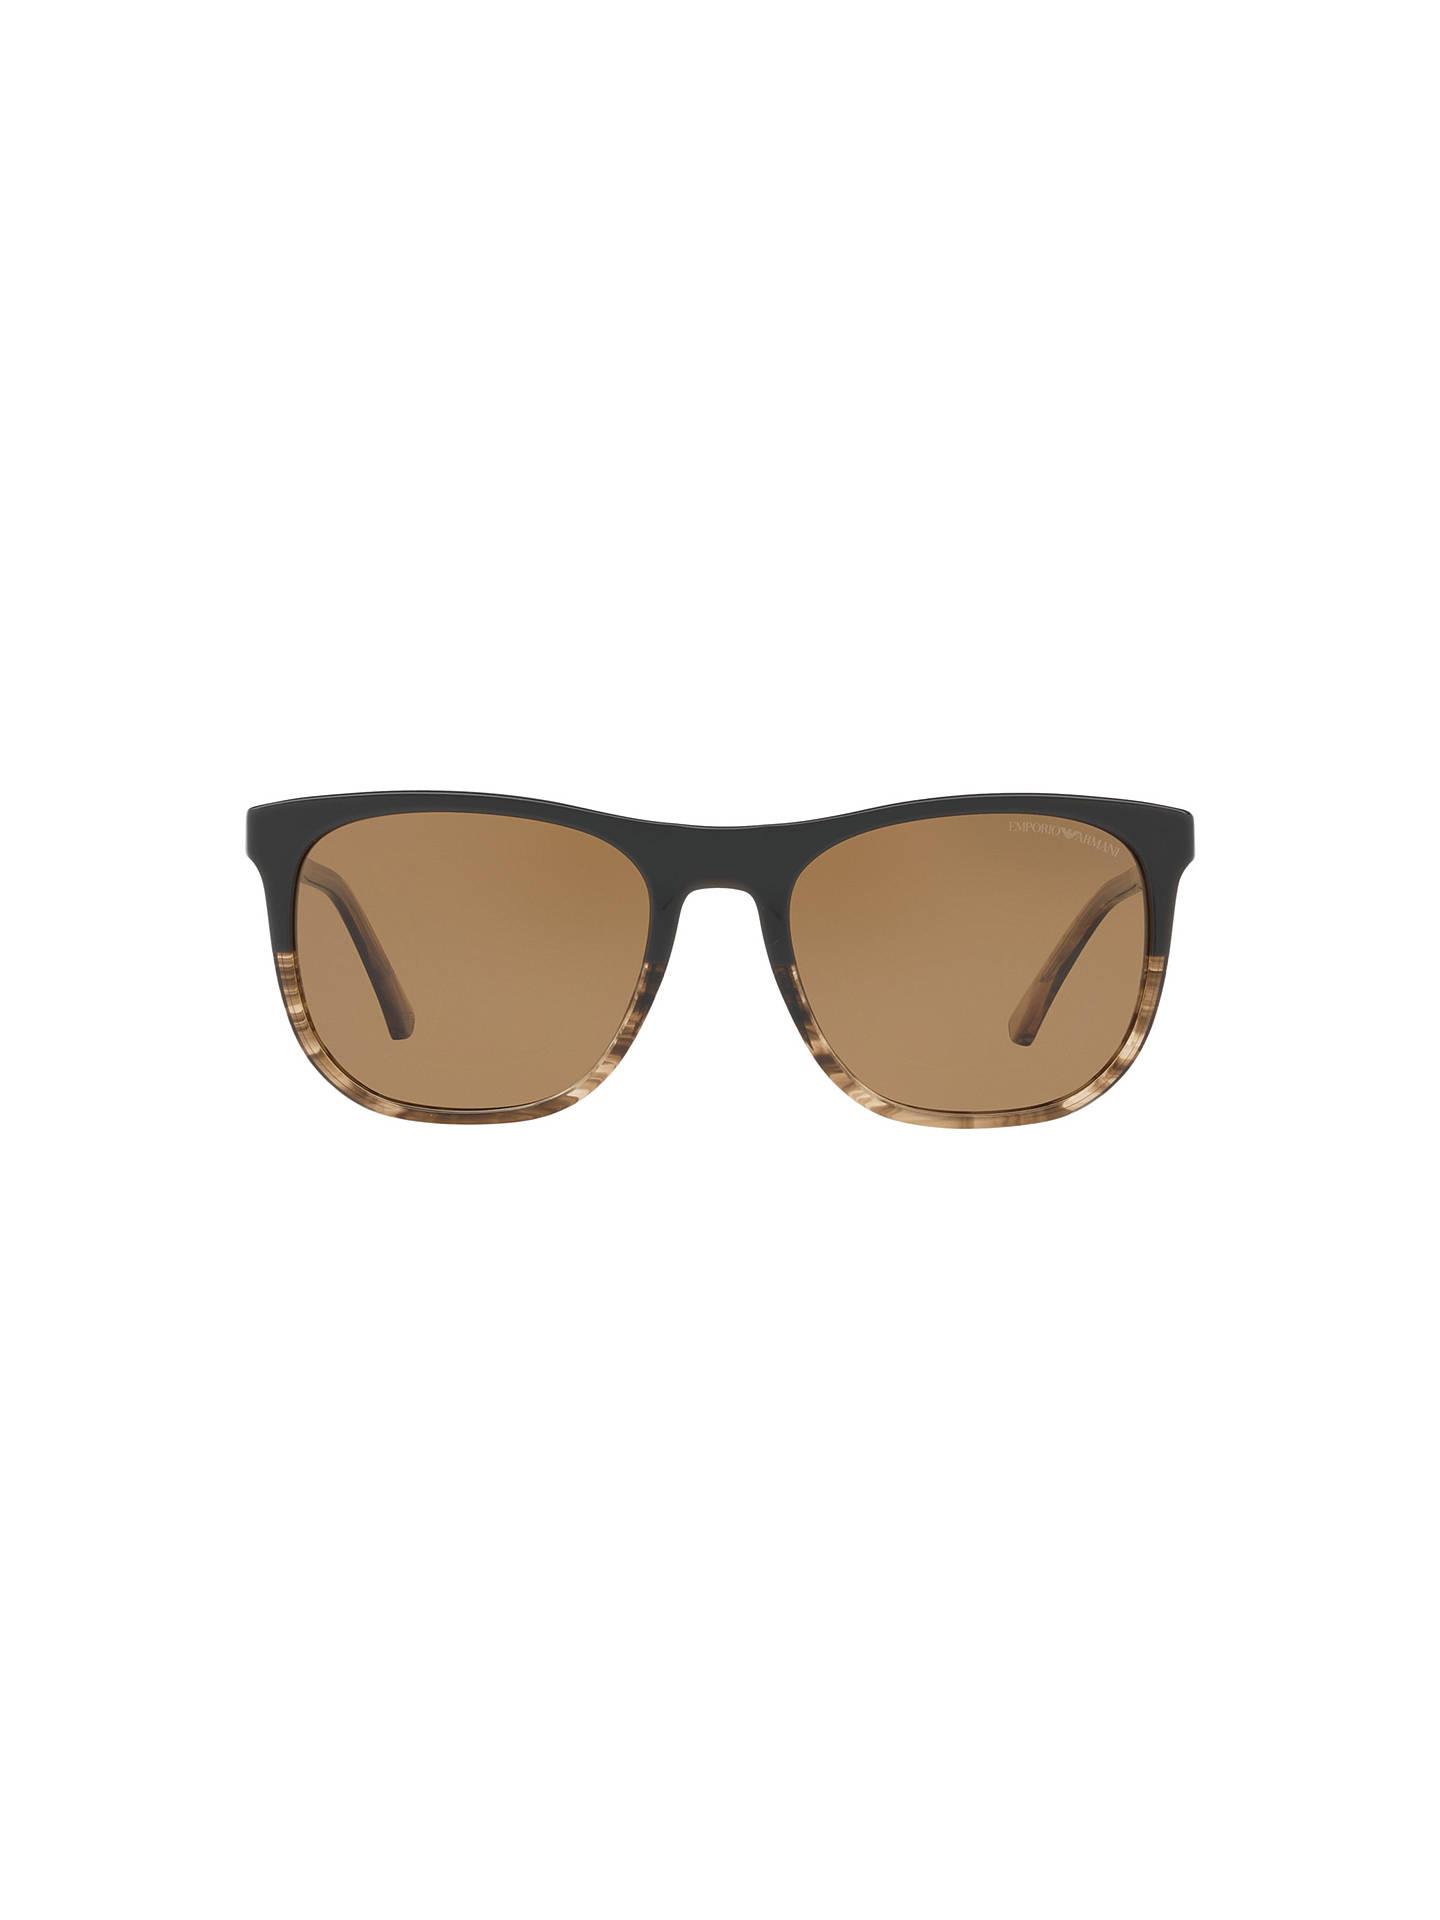 BuyEmporio Armani EA4099 Polarised Square Sunglasses, Matte Black  Pattern Brown Online at johnlewis. 3b5d18b783